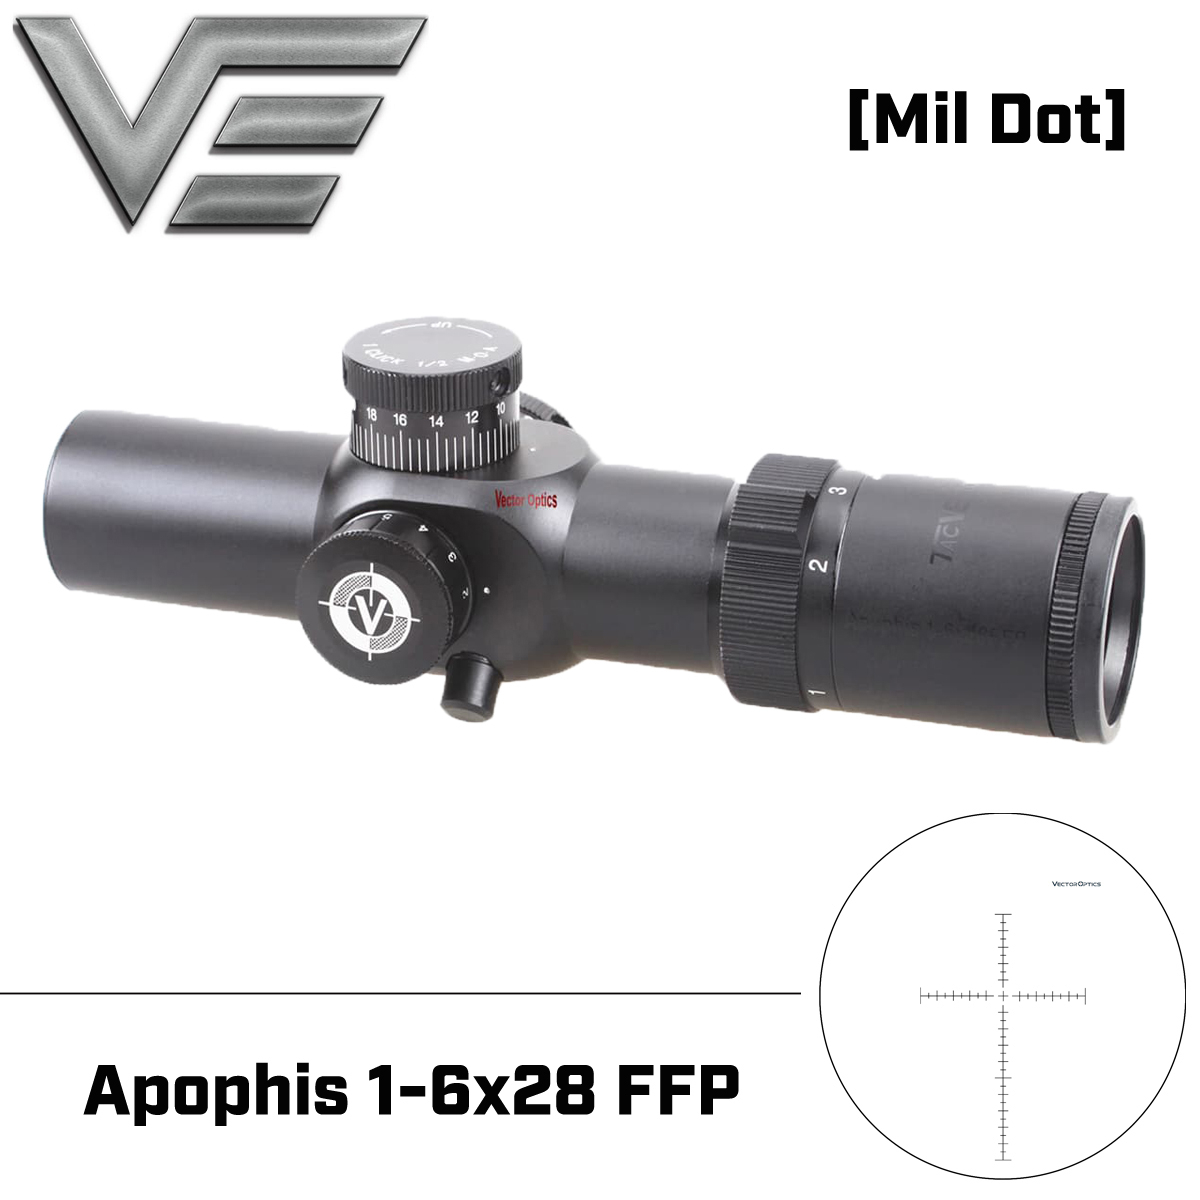 Óptica de Vector Apofis 1-6x28 FFP 35mm rifloscopio táctico AR15 Rifle compacto alcance MP MOA retícula para disparo